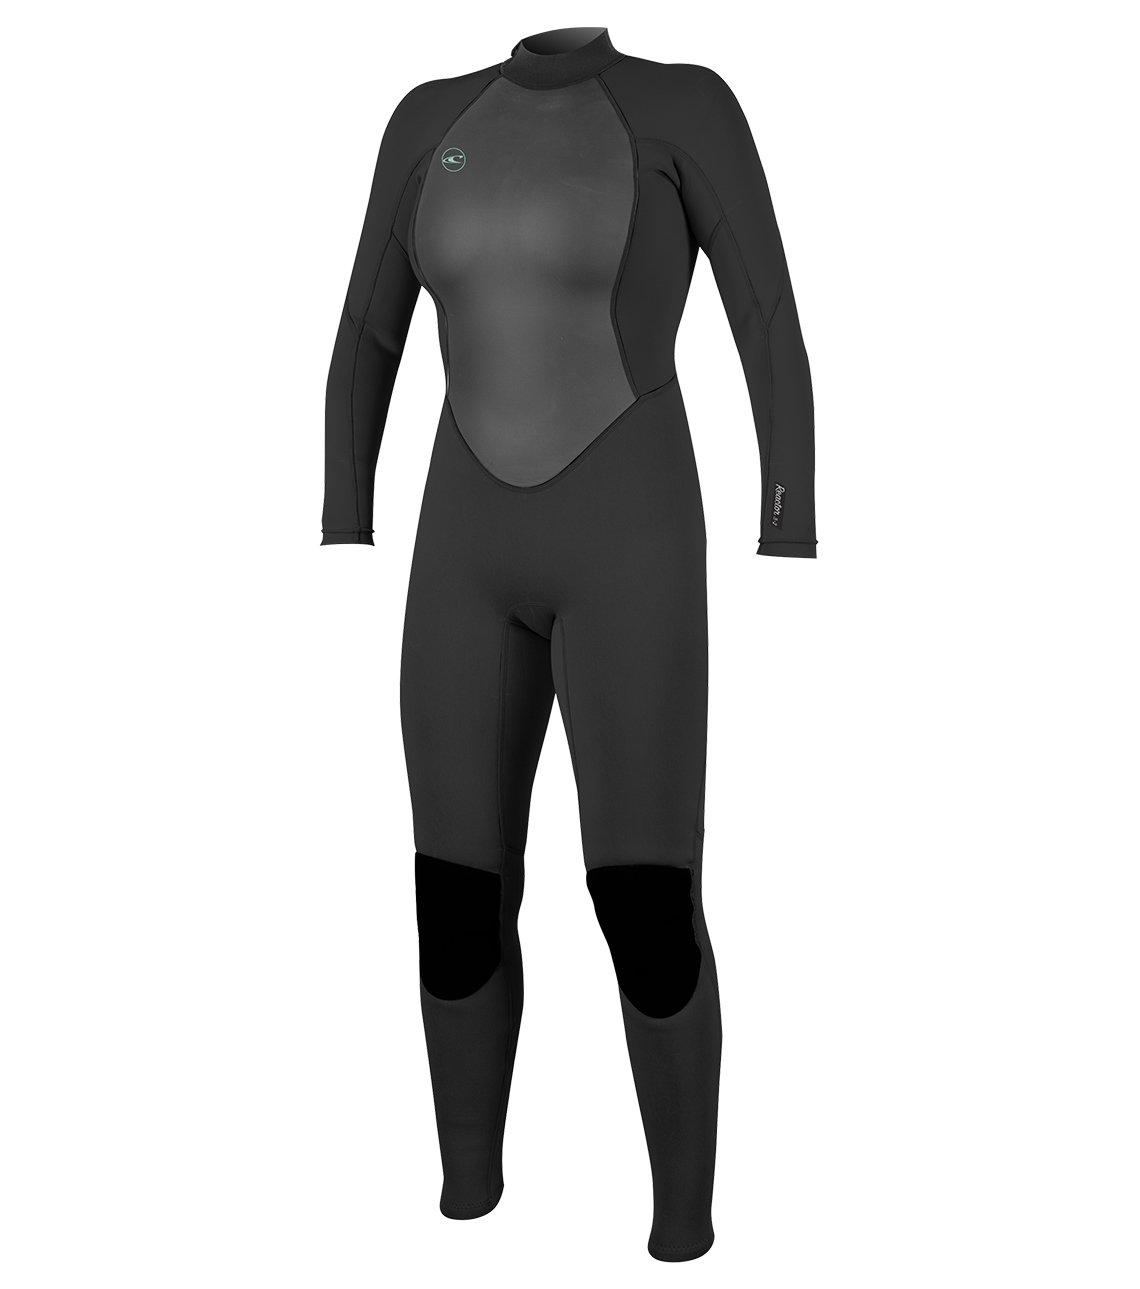 O'Neill Women's Reactor-2 3/2mm Back Zip Full Wetsuit, Black, 4